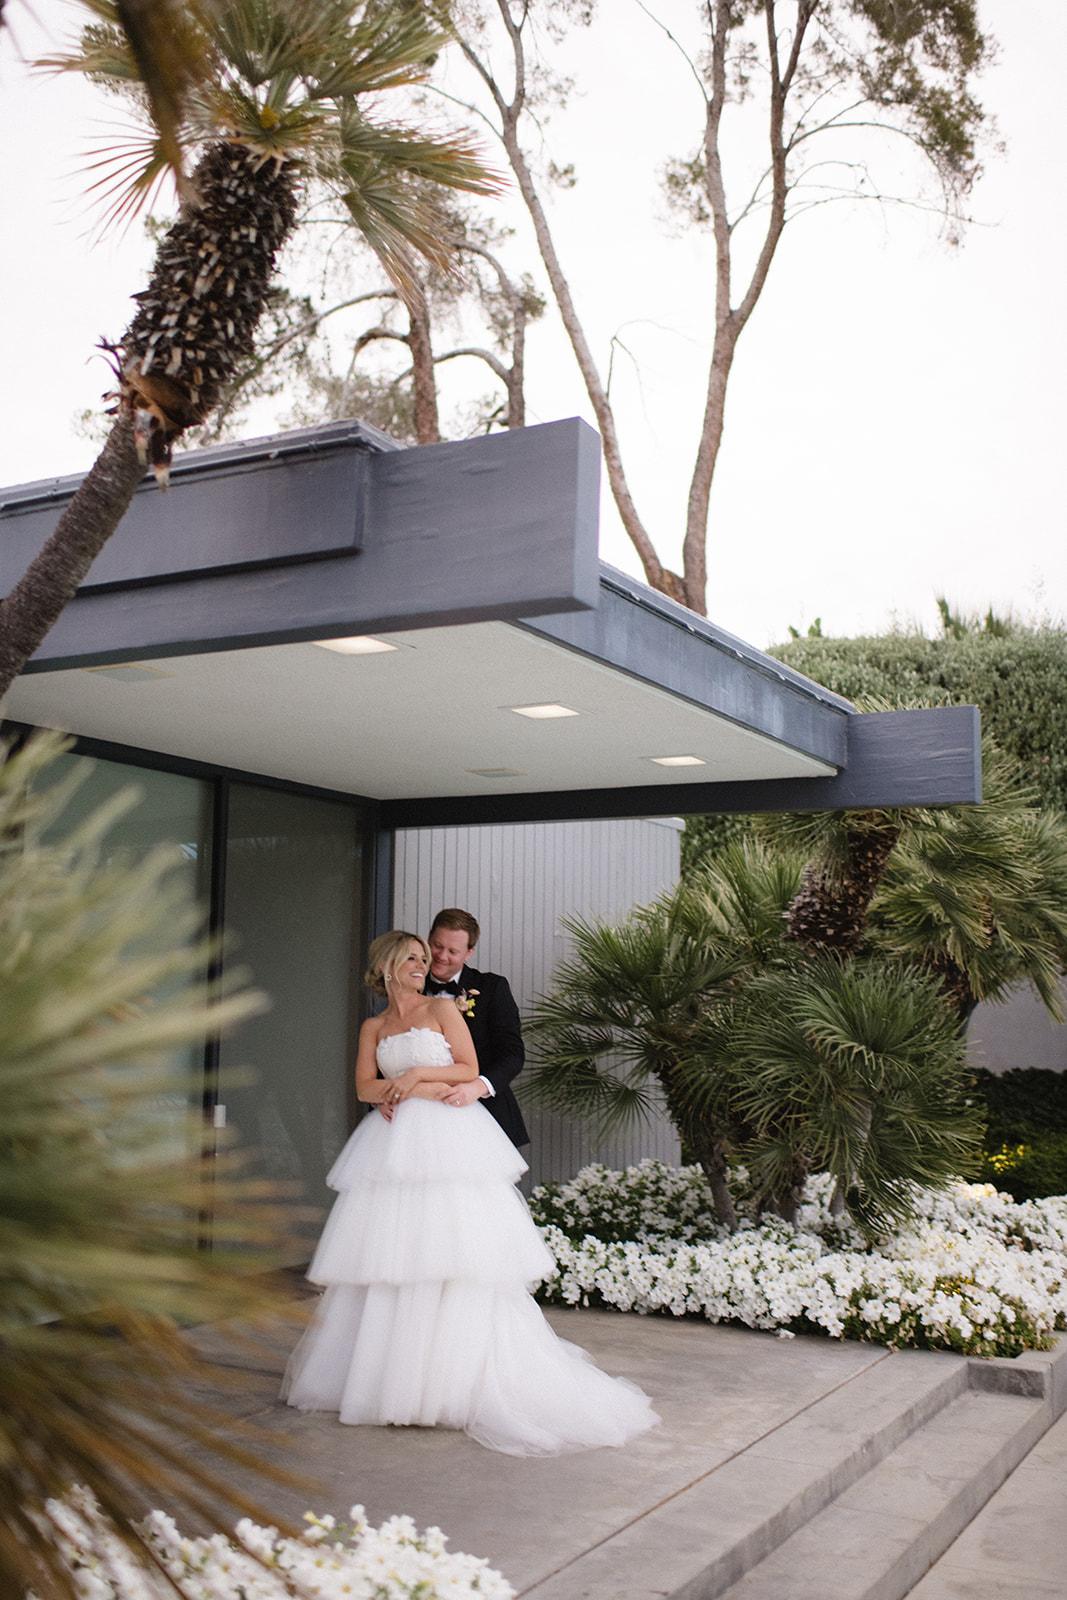 KL_WEDDING_0627.jpg